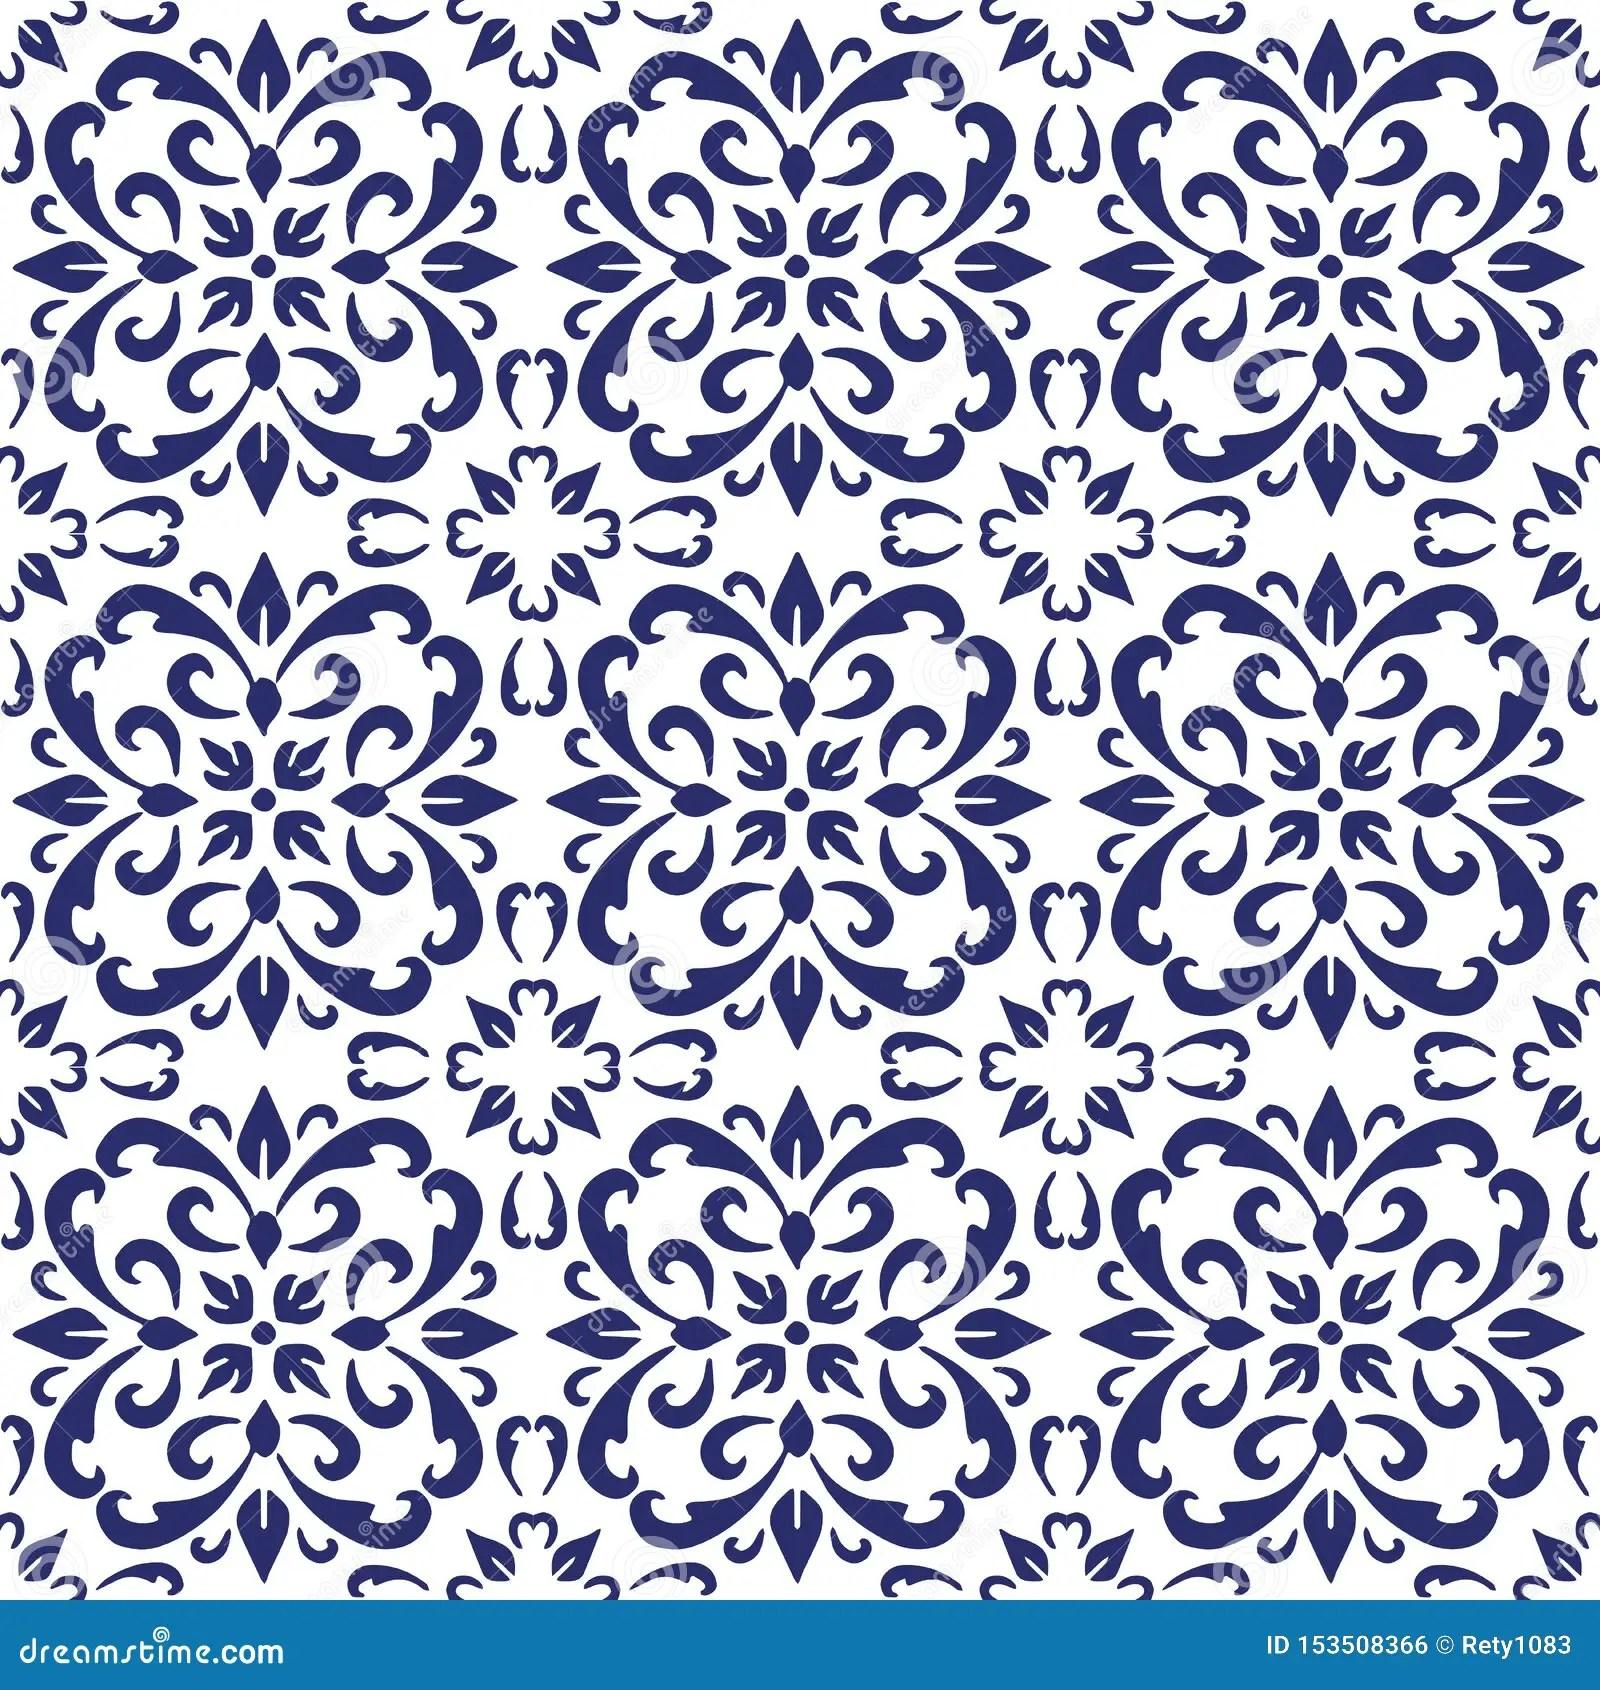 https www dreamstime com ceramic tile portuguese tiles blue white moroccan tiles blue white kitchen tiles bathroom tiles surface pattern vector image153508366